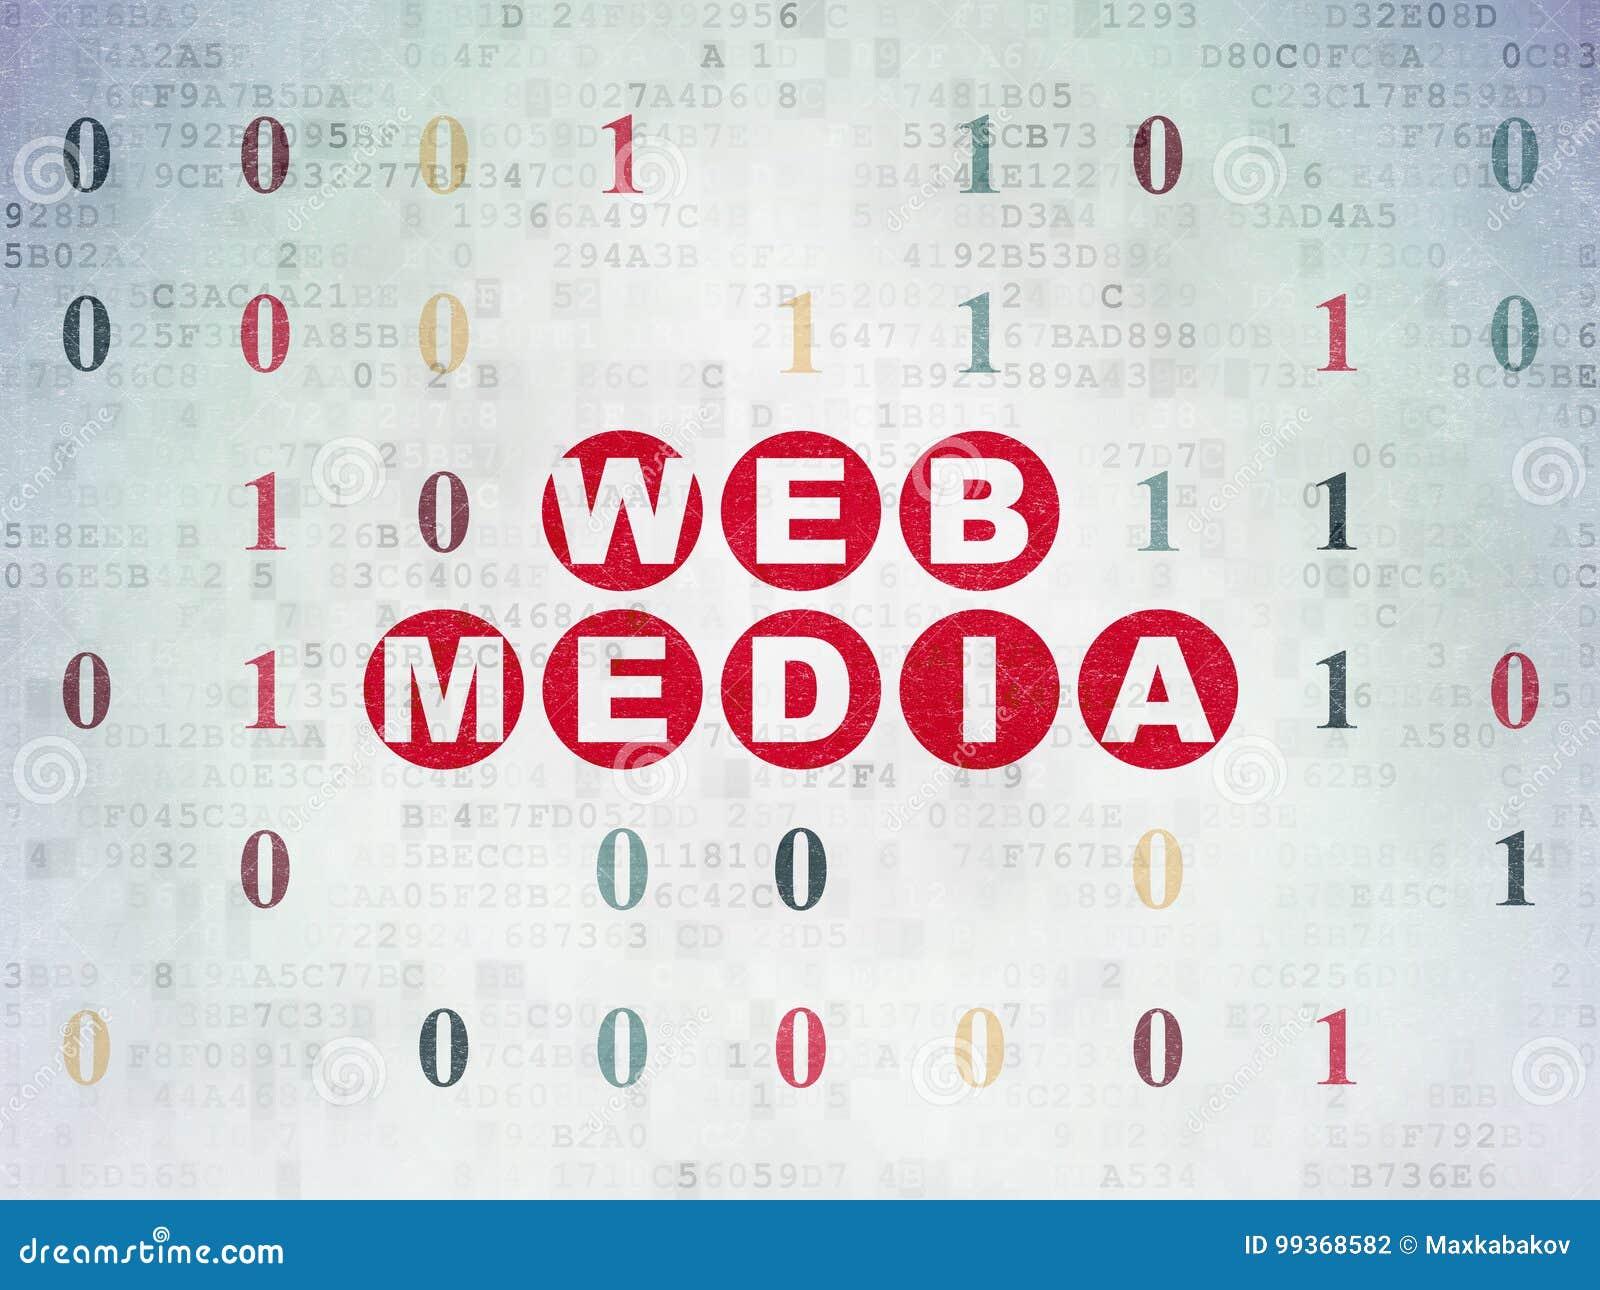 Web Development Concept Web Media On Digital Data Paper Background